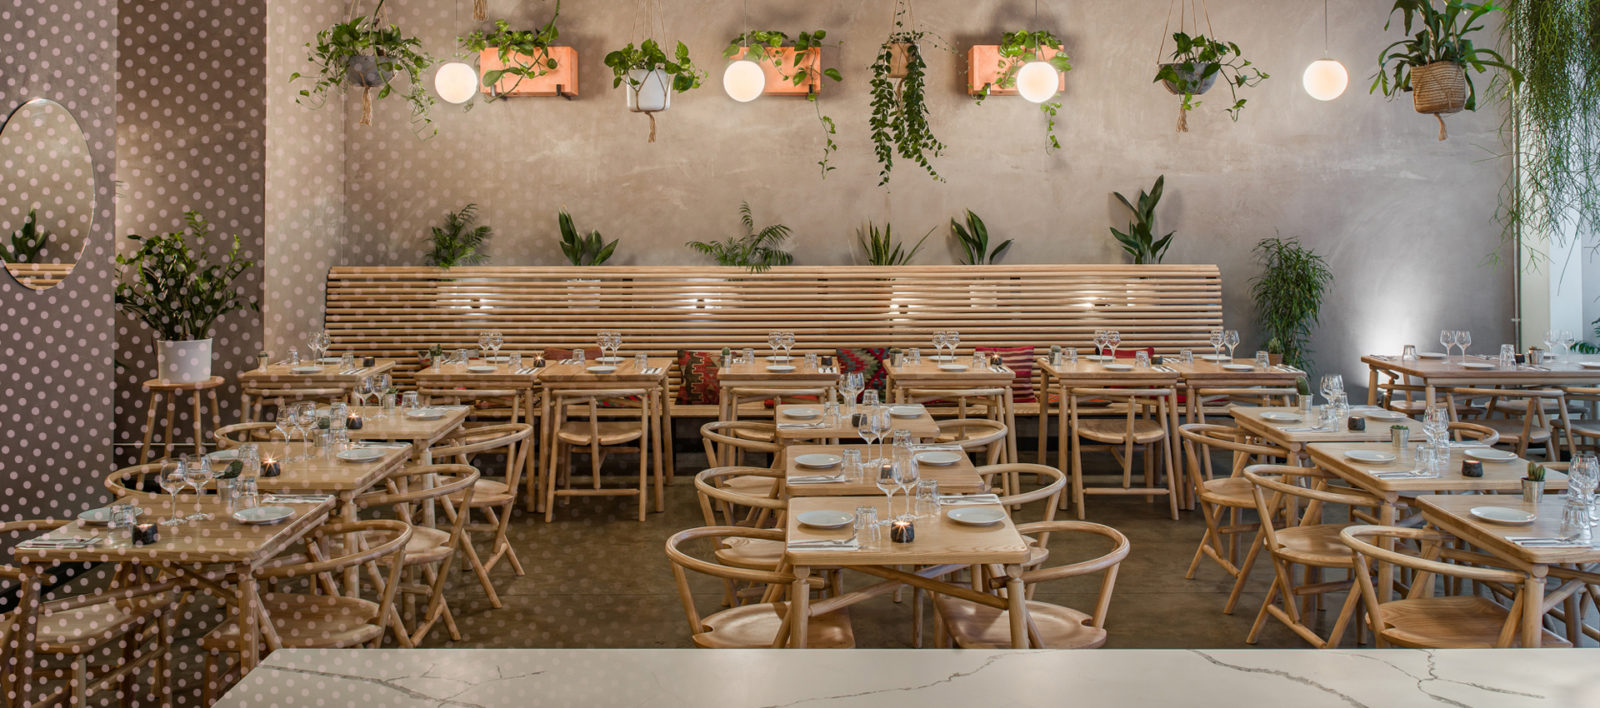 This Is Amber Amber Restaurant Café Café In Aldgate East